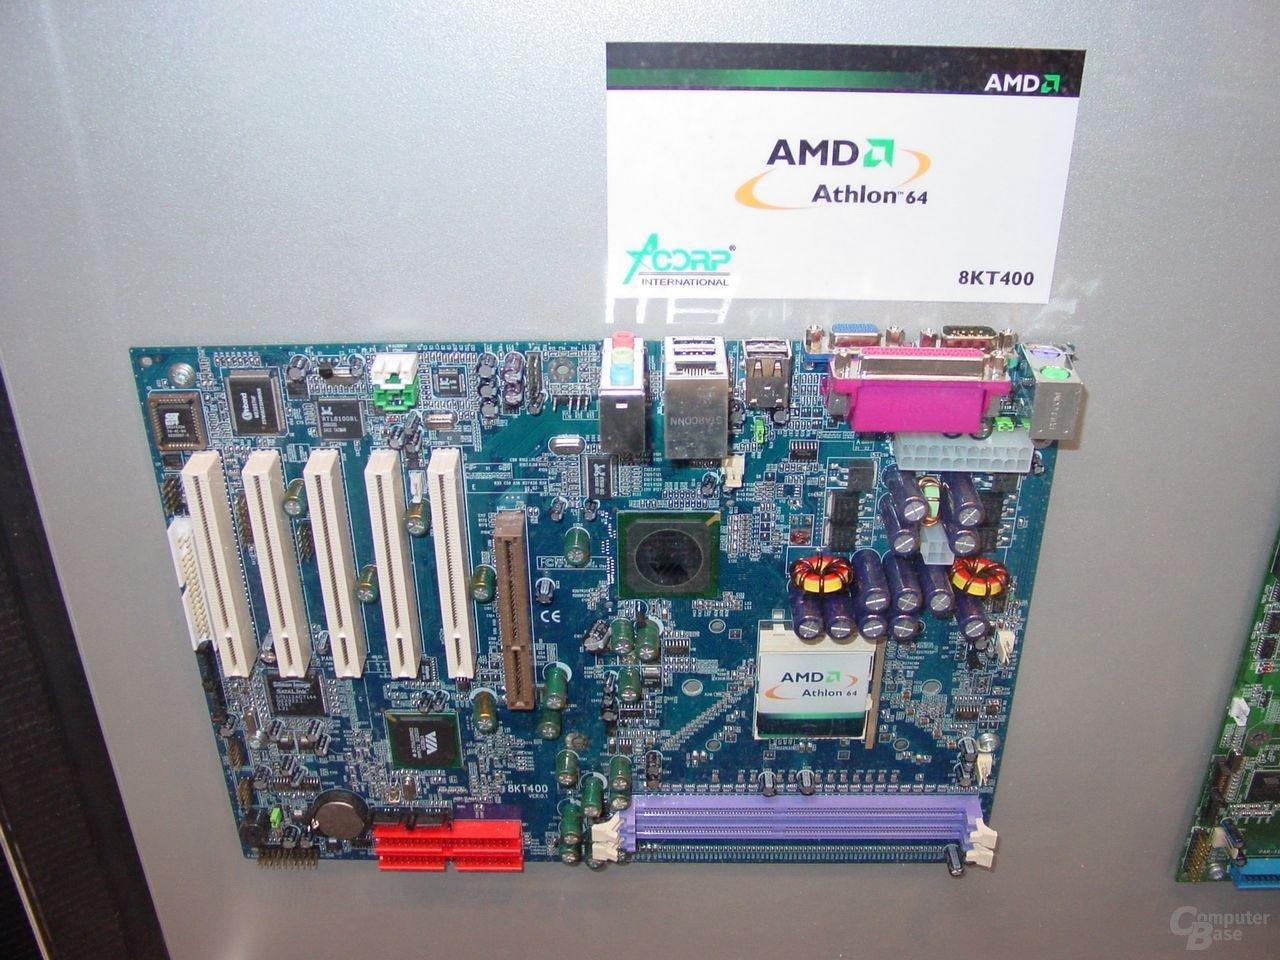 Acorp Mainboard mit VIA K8T400.JPG